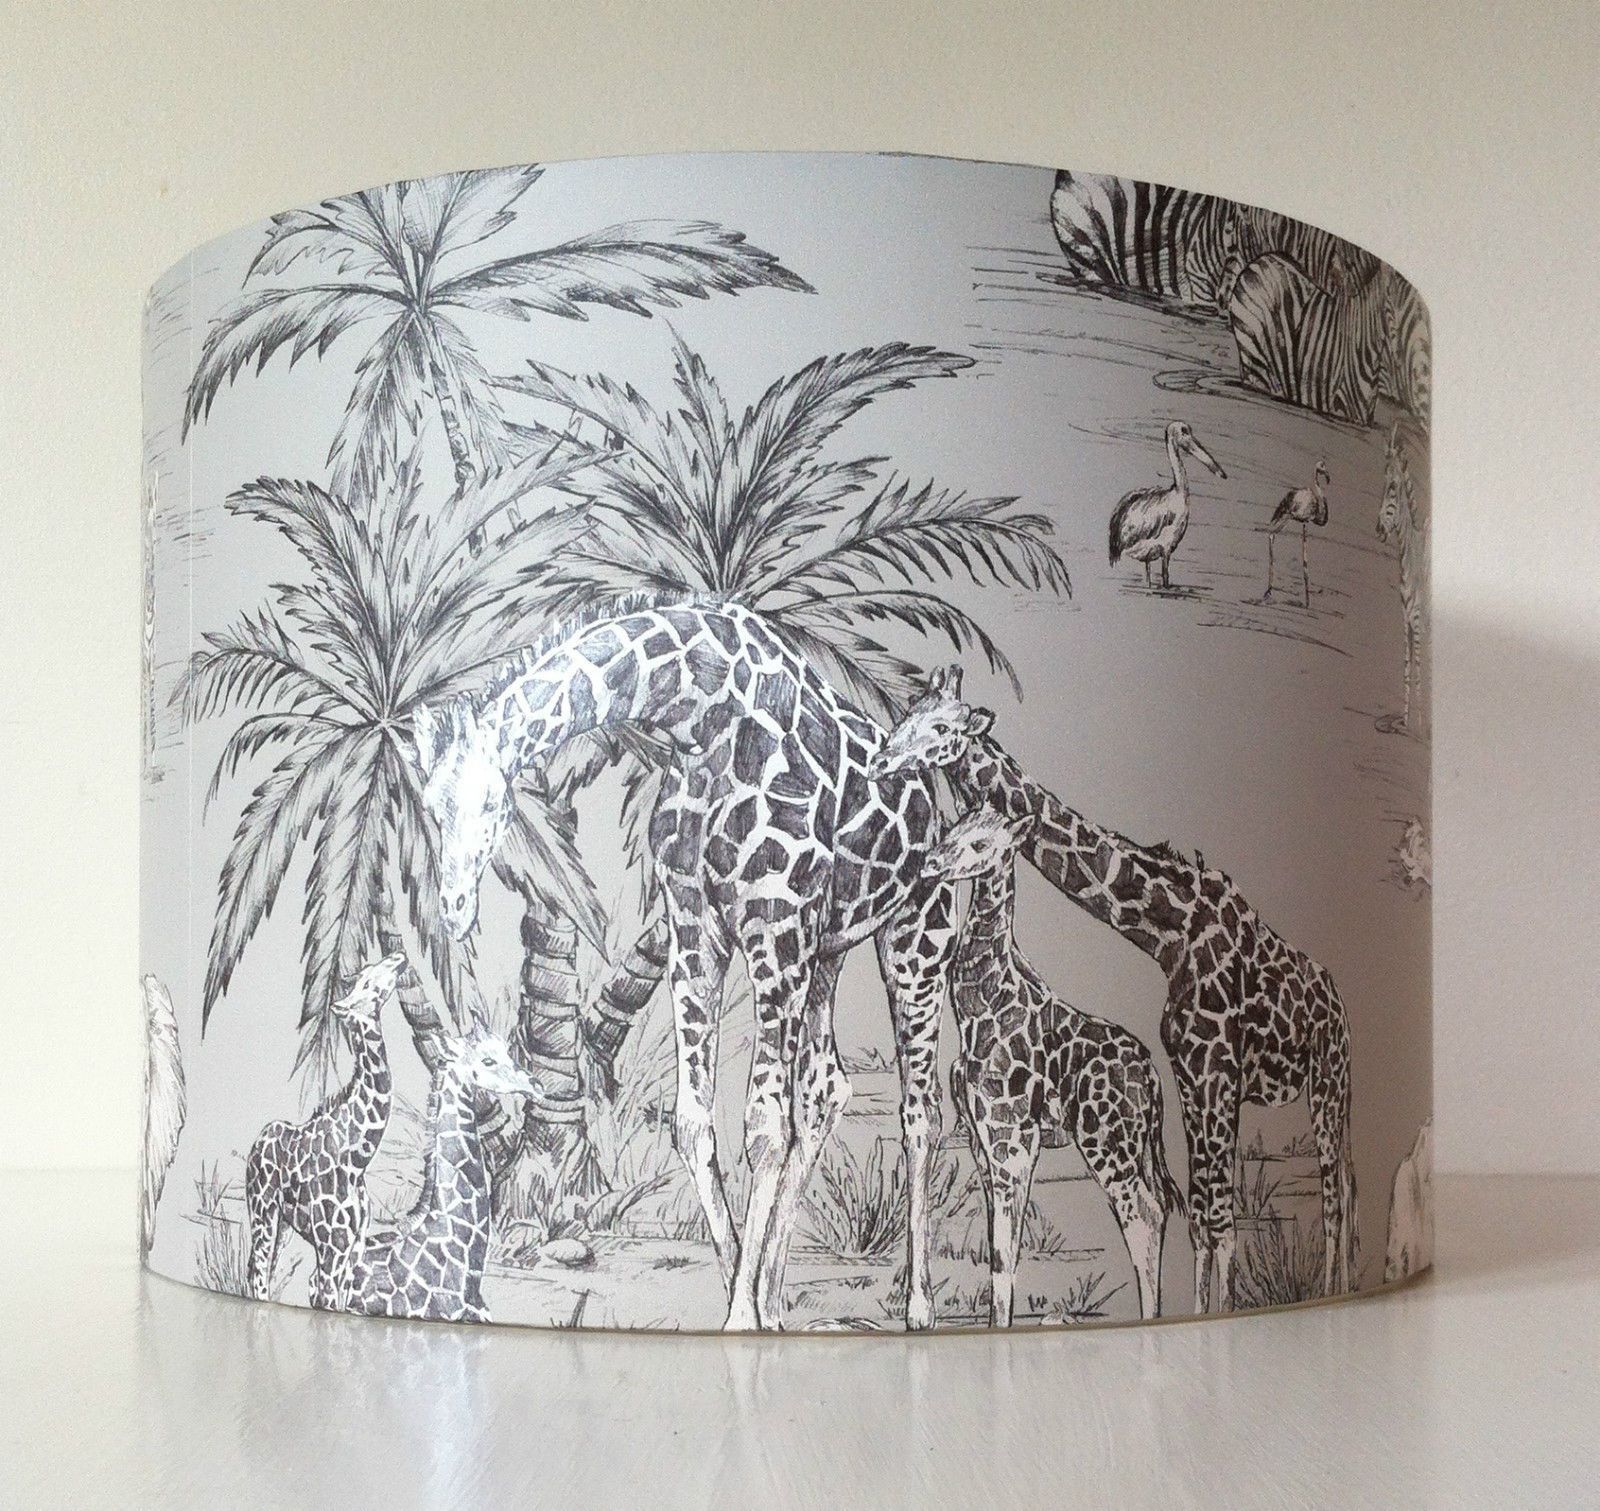 Buq watering hole giraffe elephant safari wallpaper handmade drum